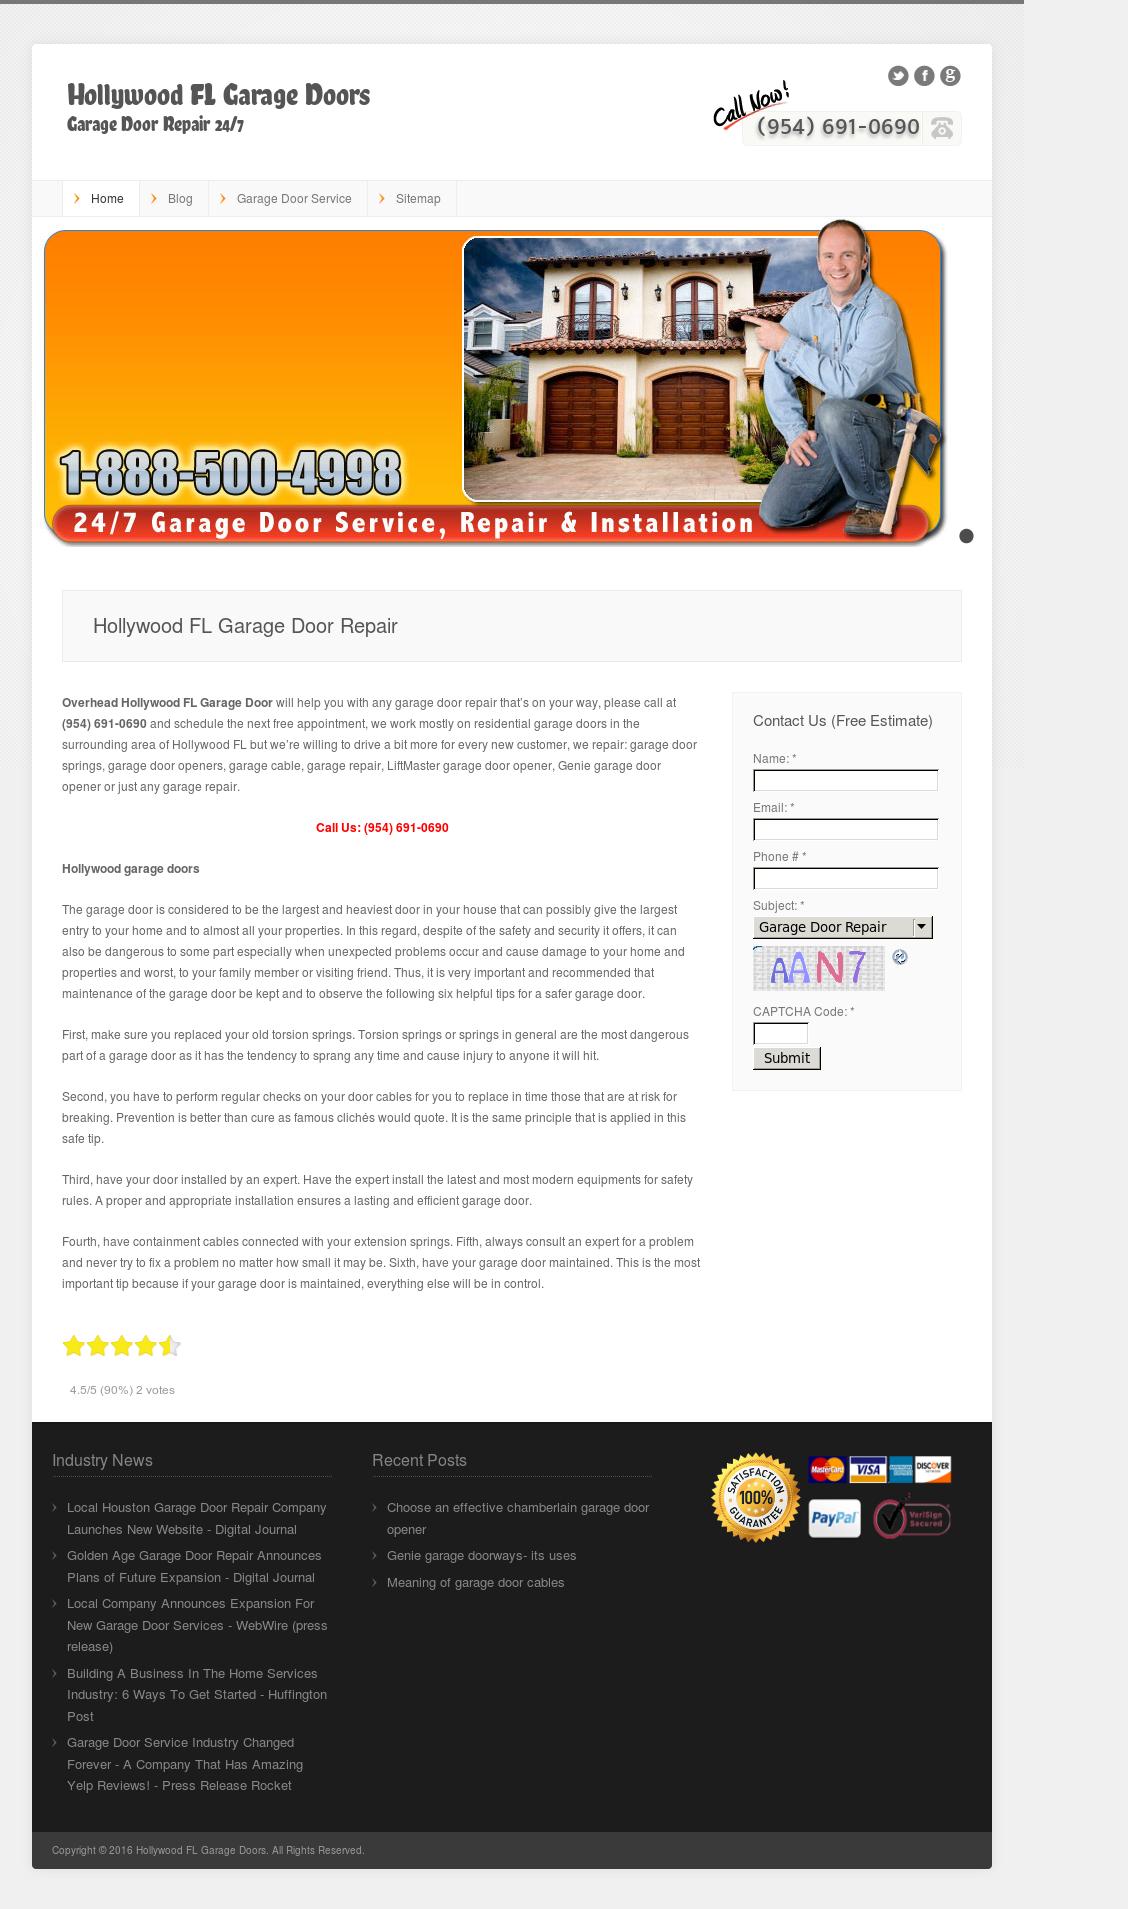 Hollywood Fl Garage Doors Website History